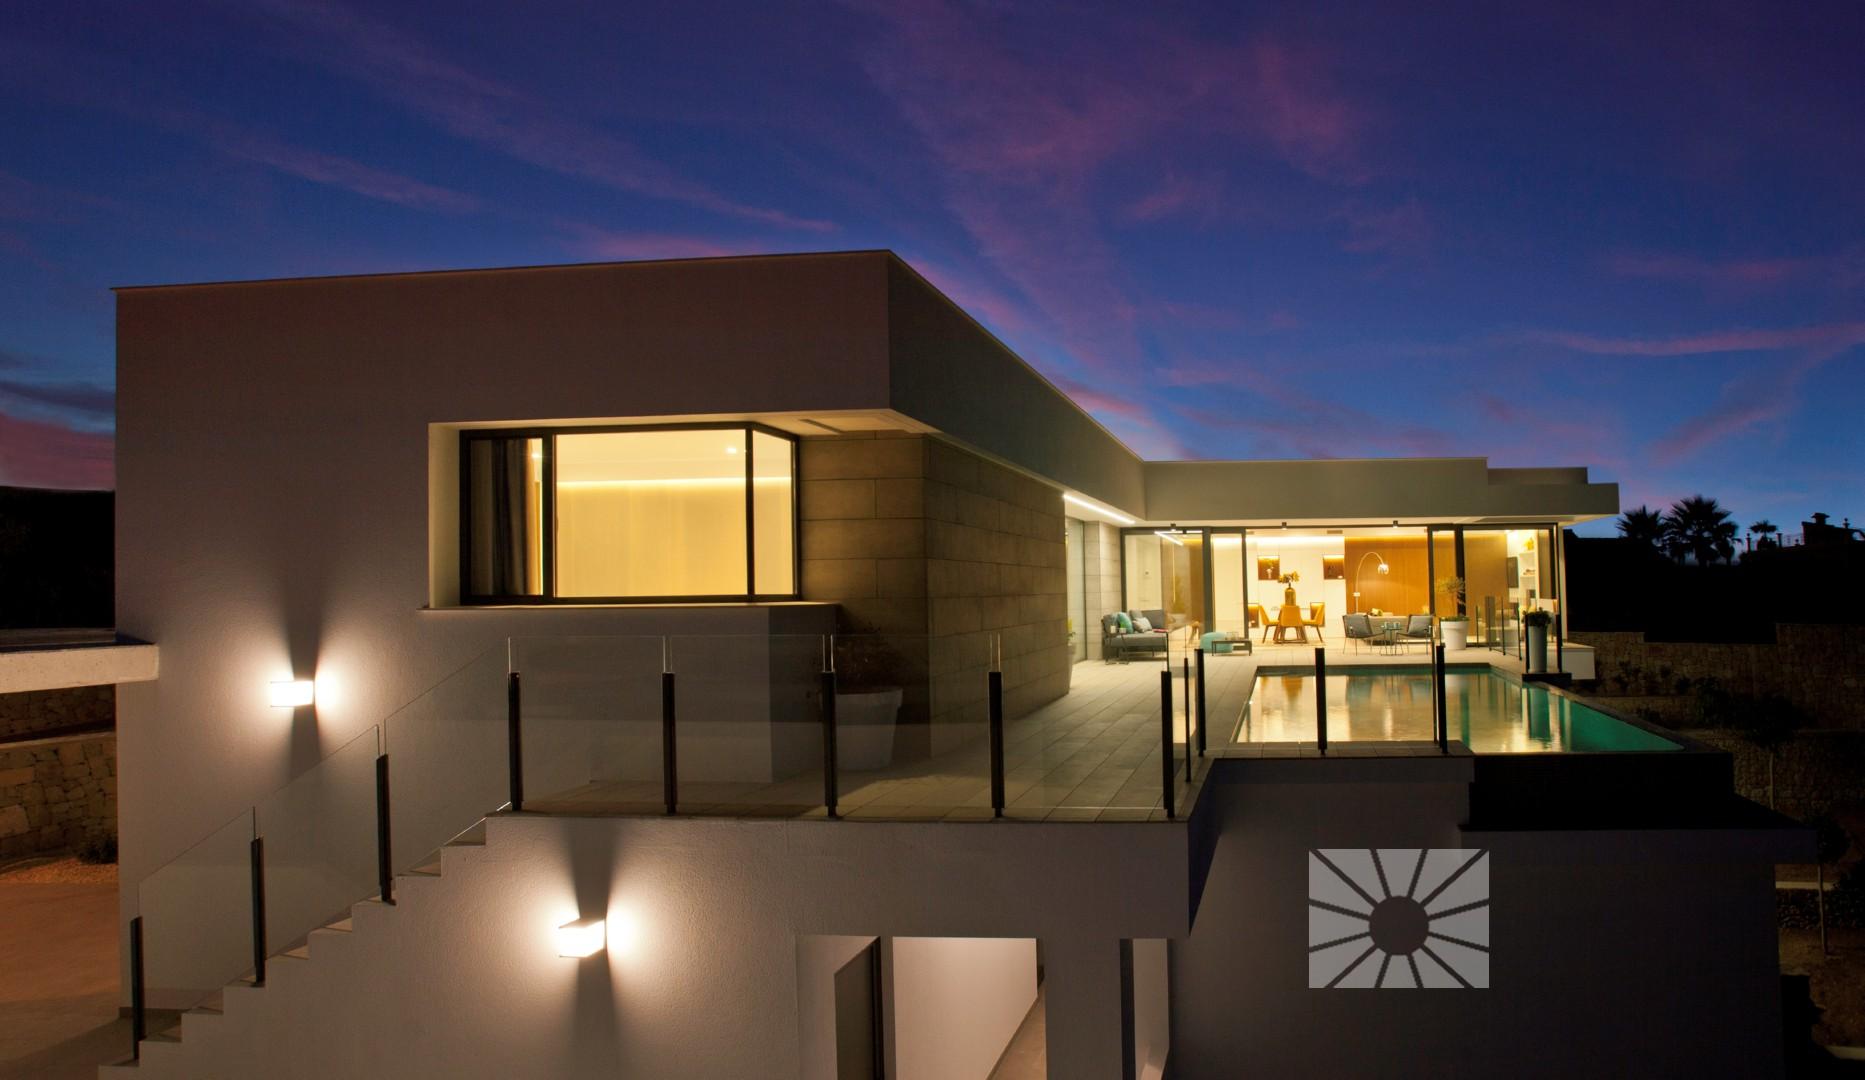 Lirios sunrise cumbre del sol villa moderne à vendre ref: al027 ...